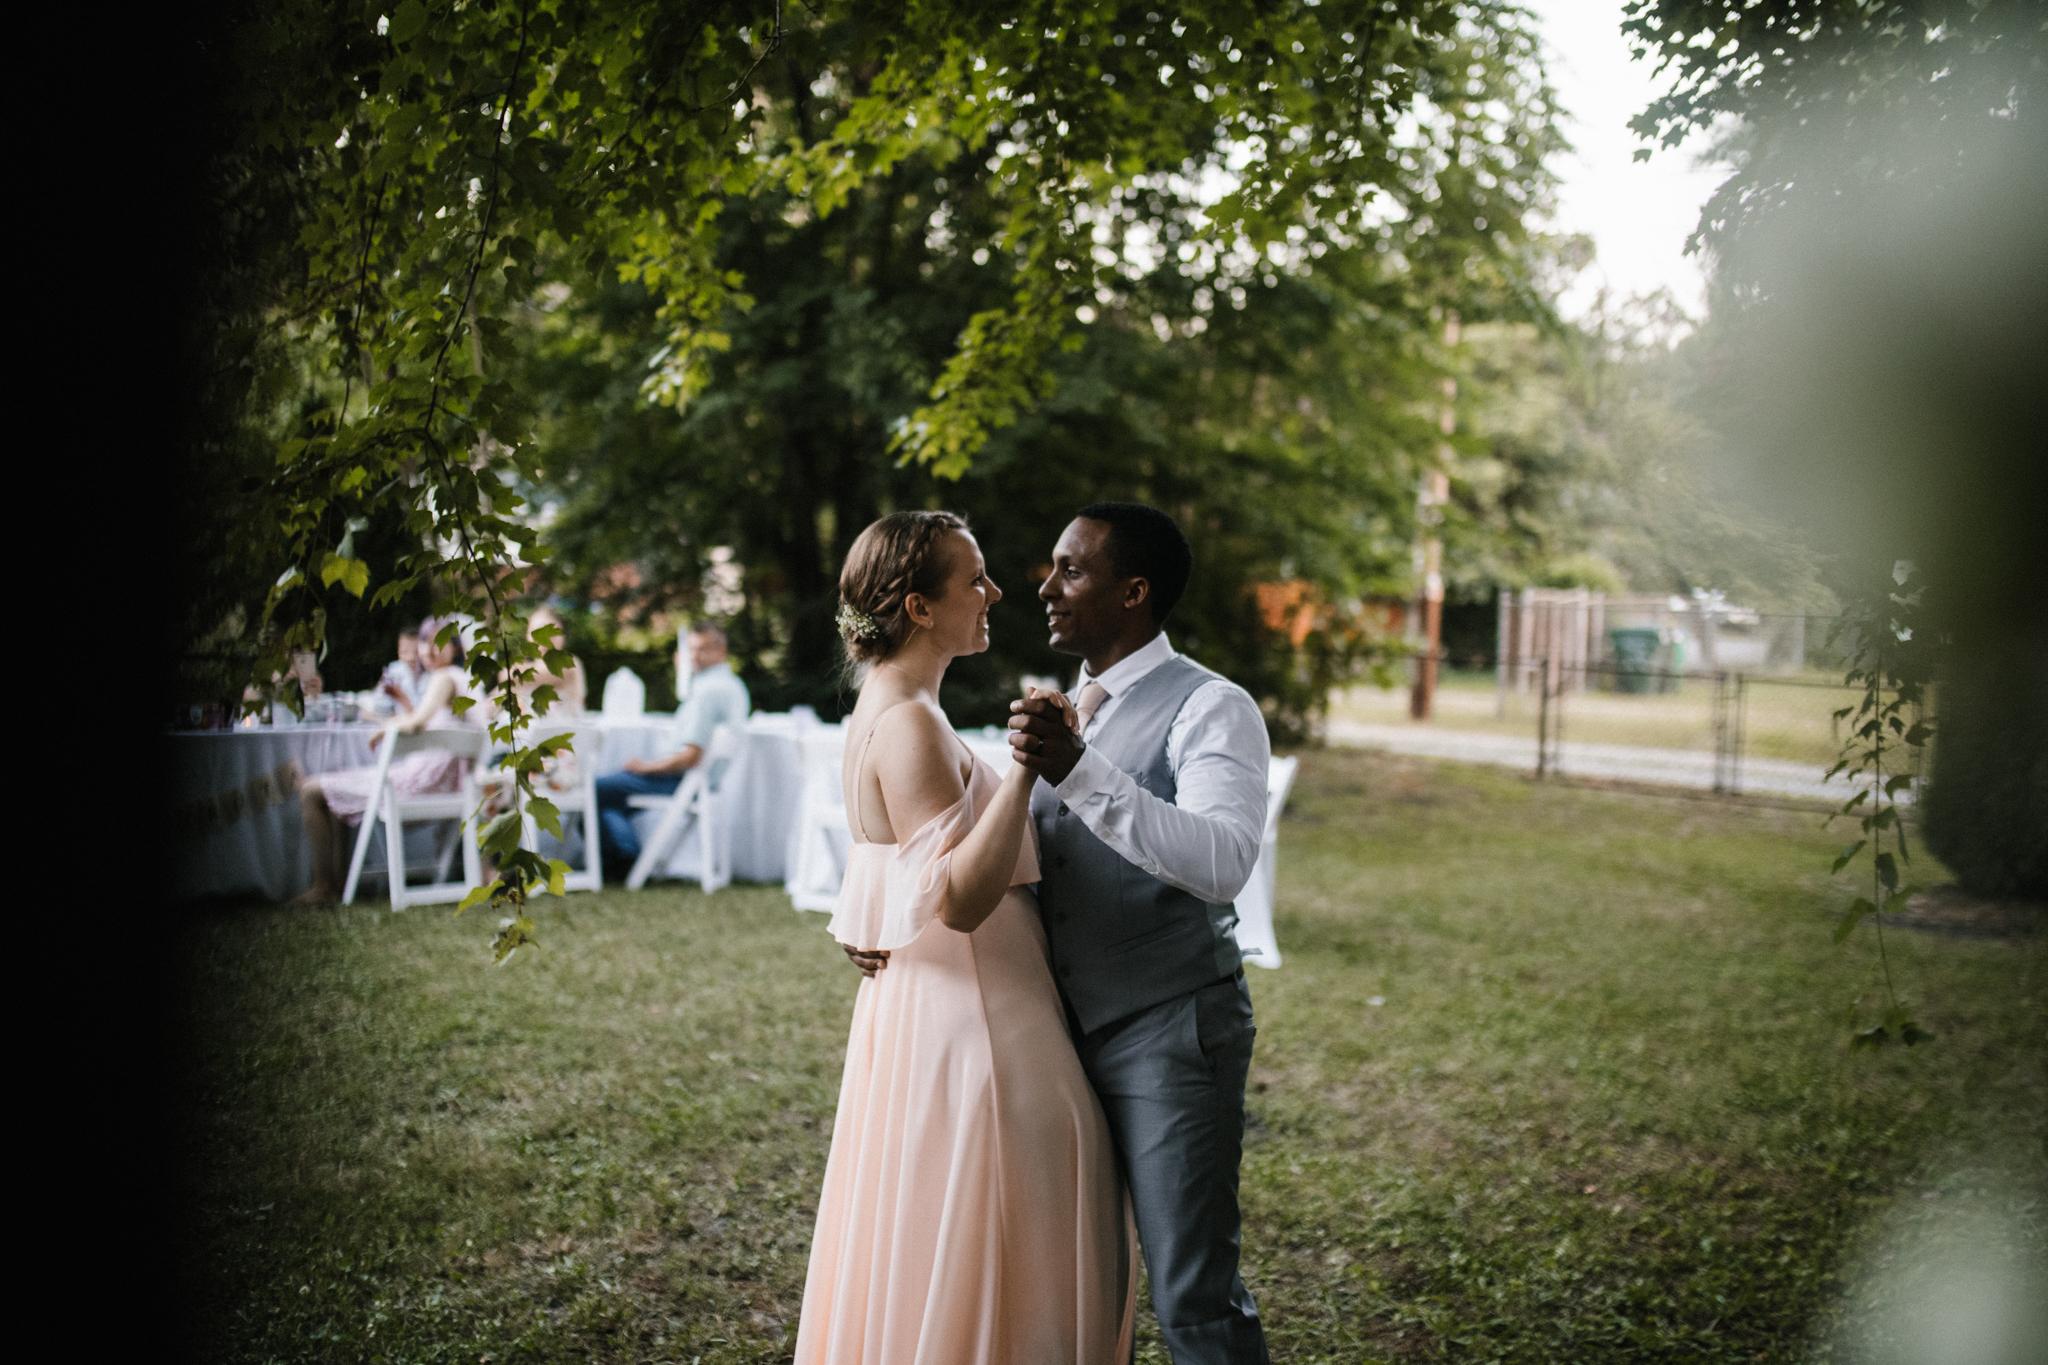 dorota_dwight_richmond_backyard_wedding-93.jpg